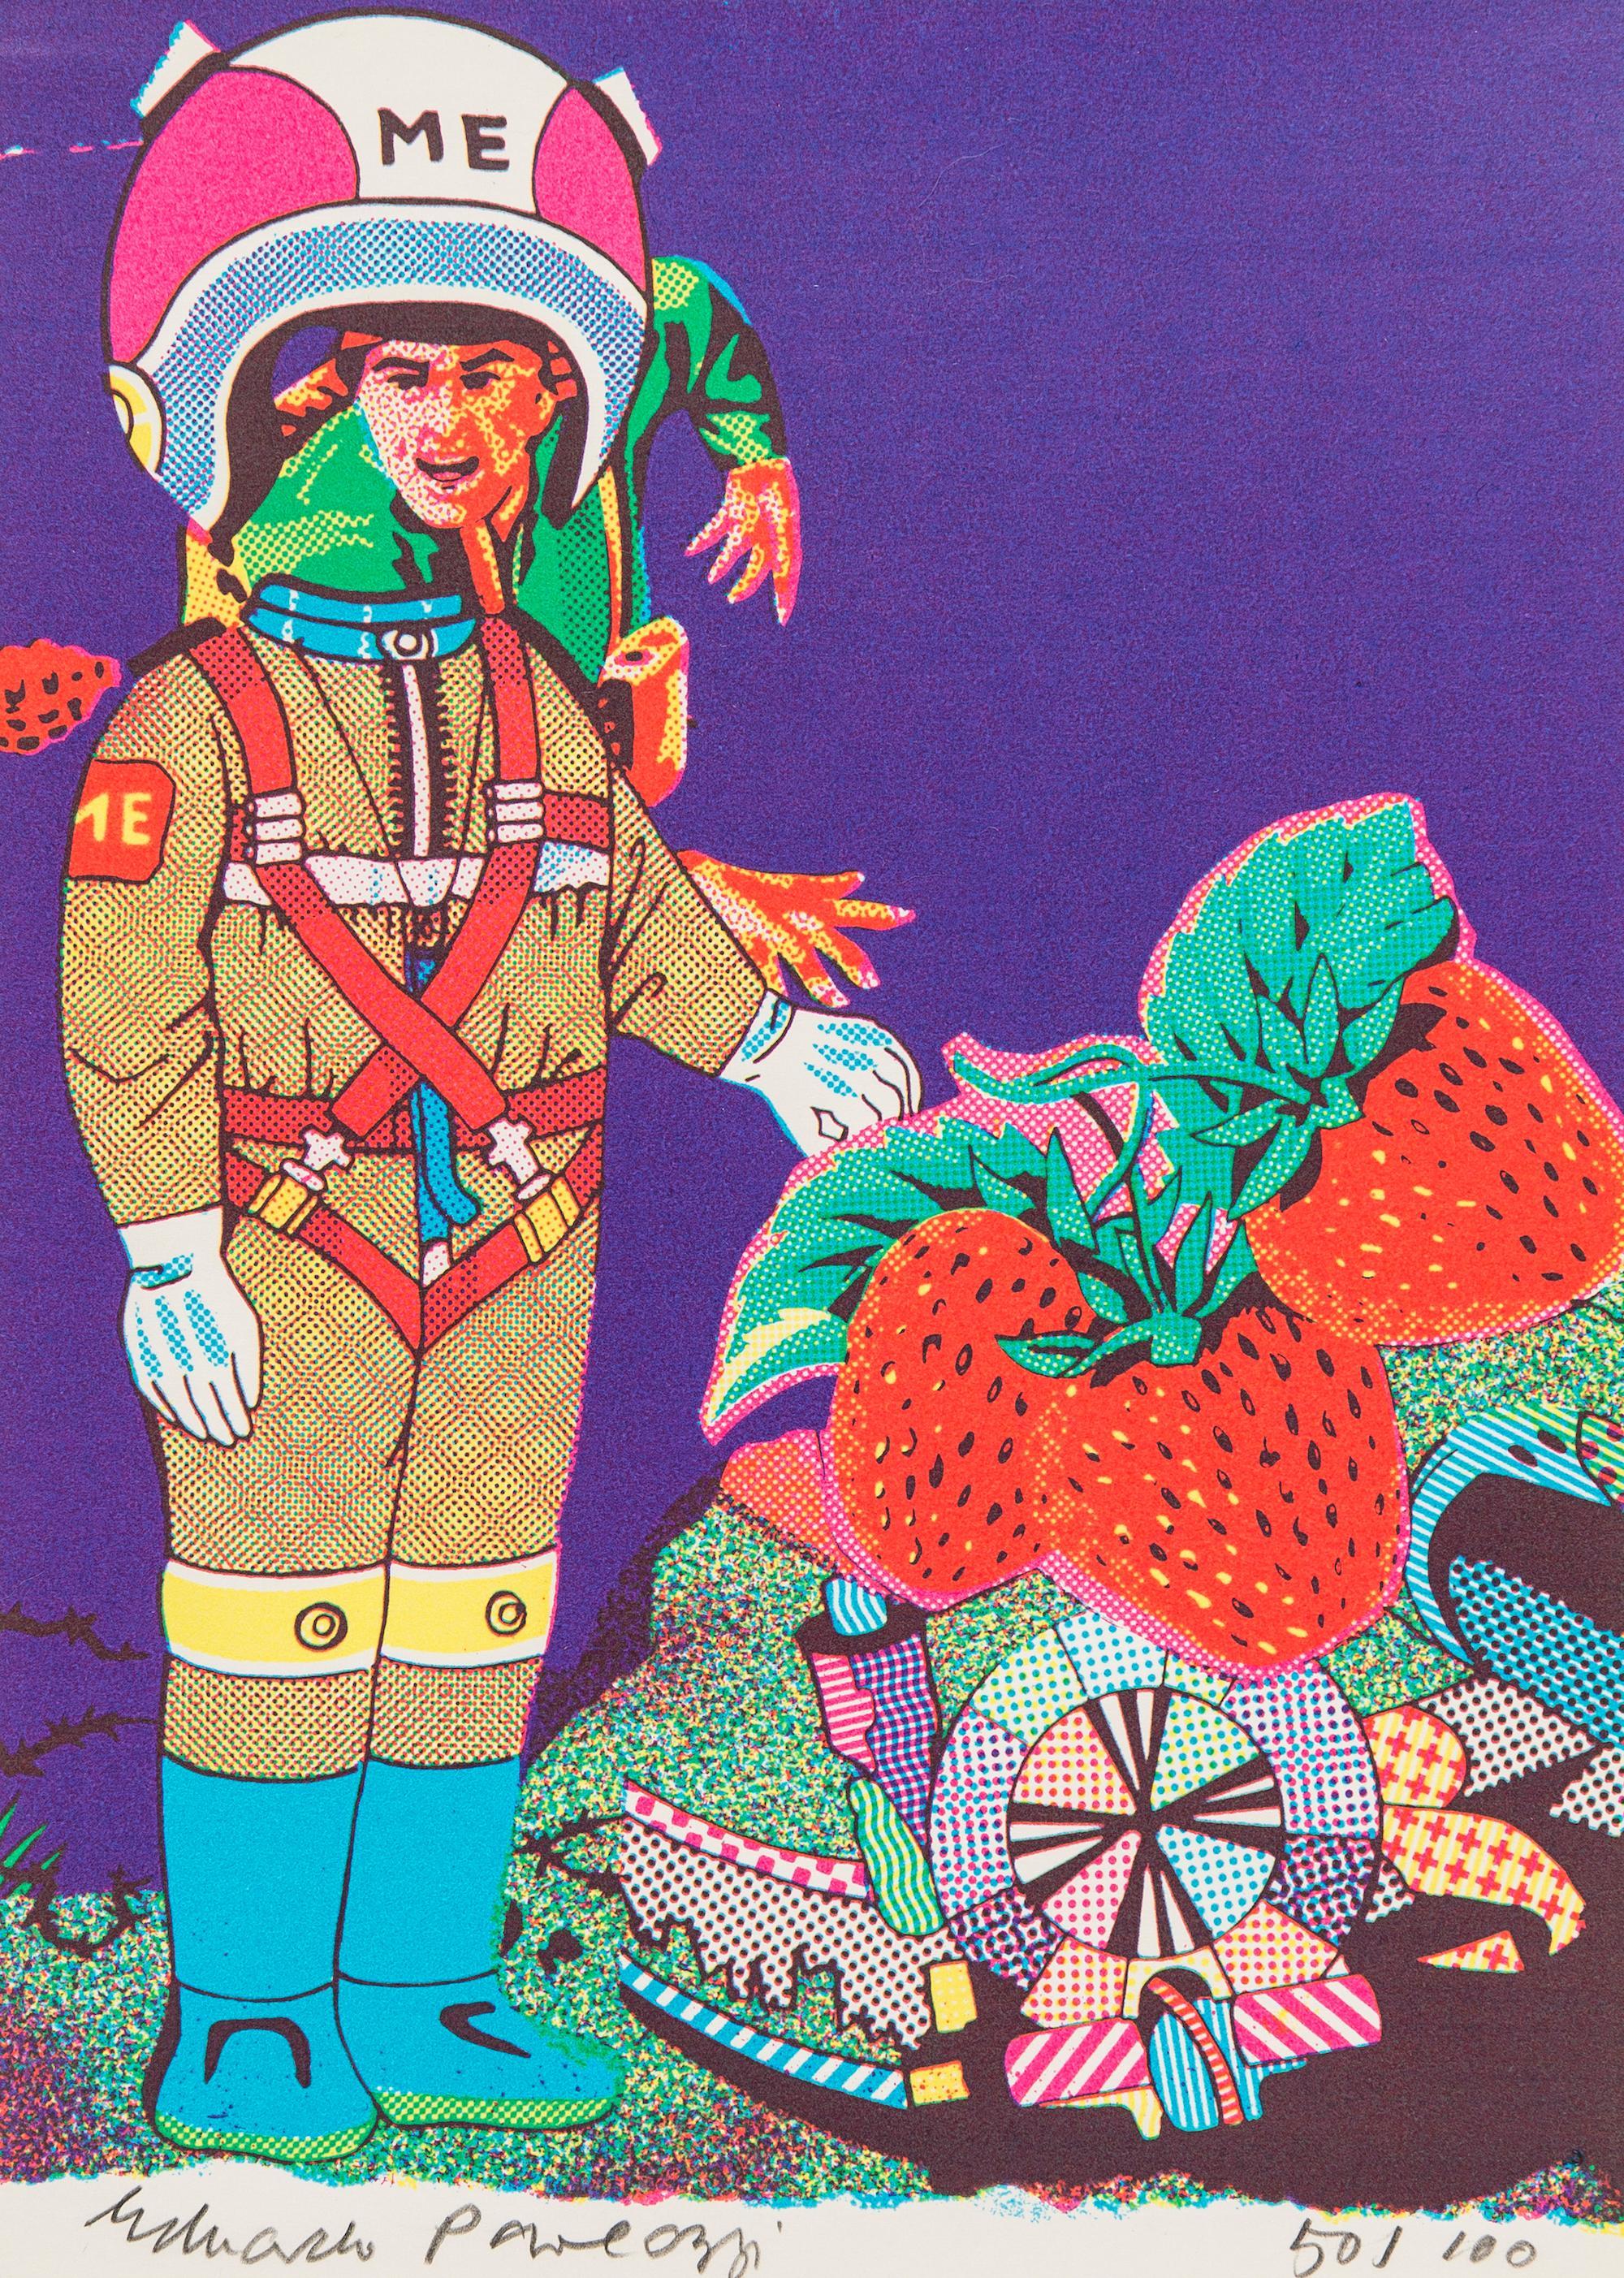 Me -- Screen Print, Portrait, Figurative Art, Pop Art by Eduardo Paolozzi